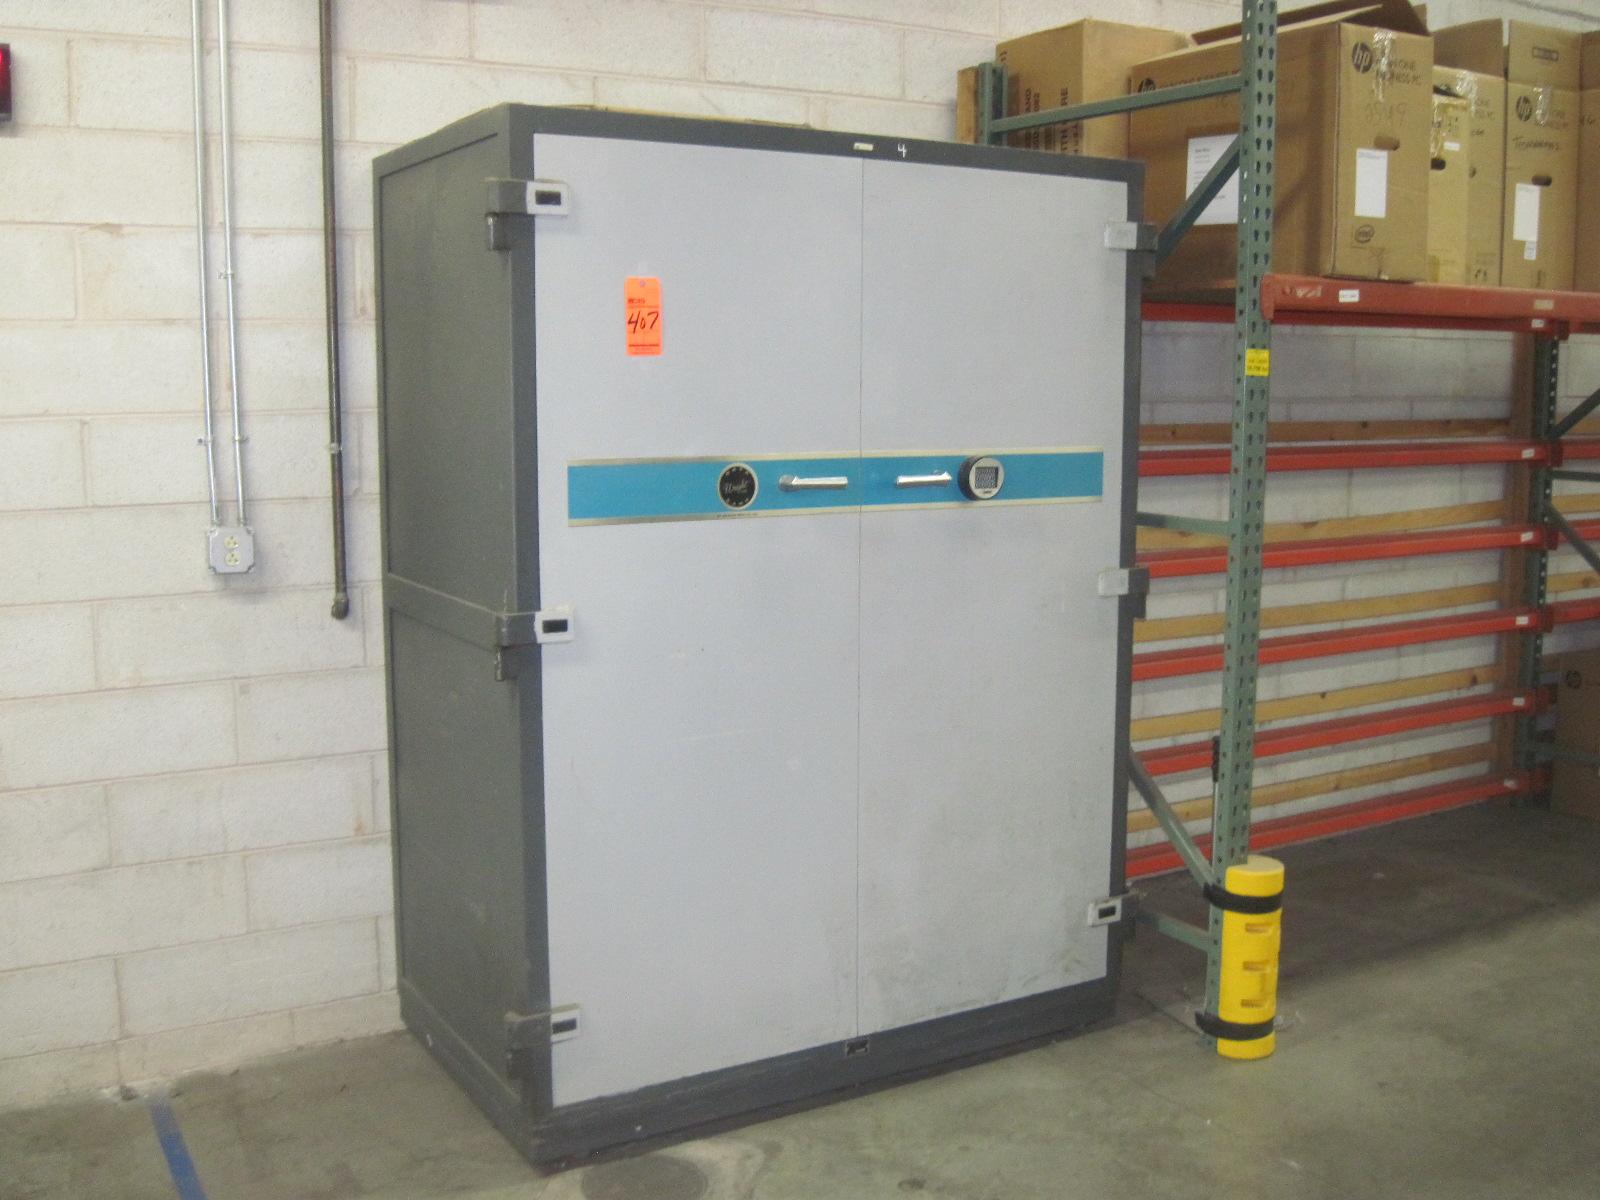 Lot 407   Schwab Safe Co. Wright Line Databank 2 Door Safe With Combination  Keypad